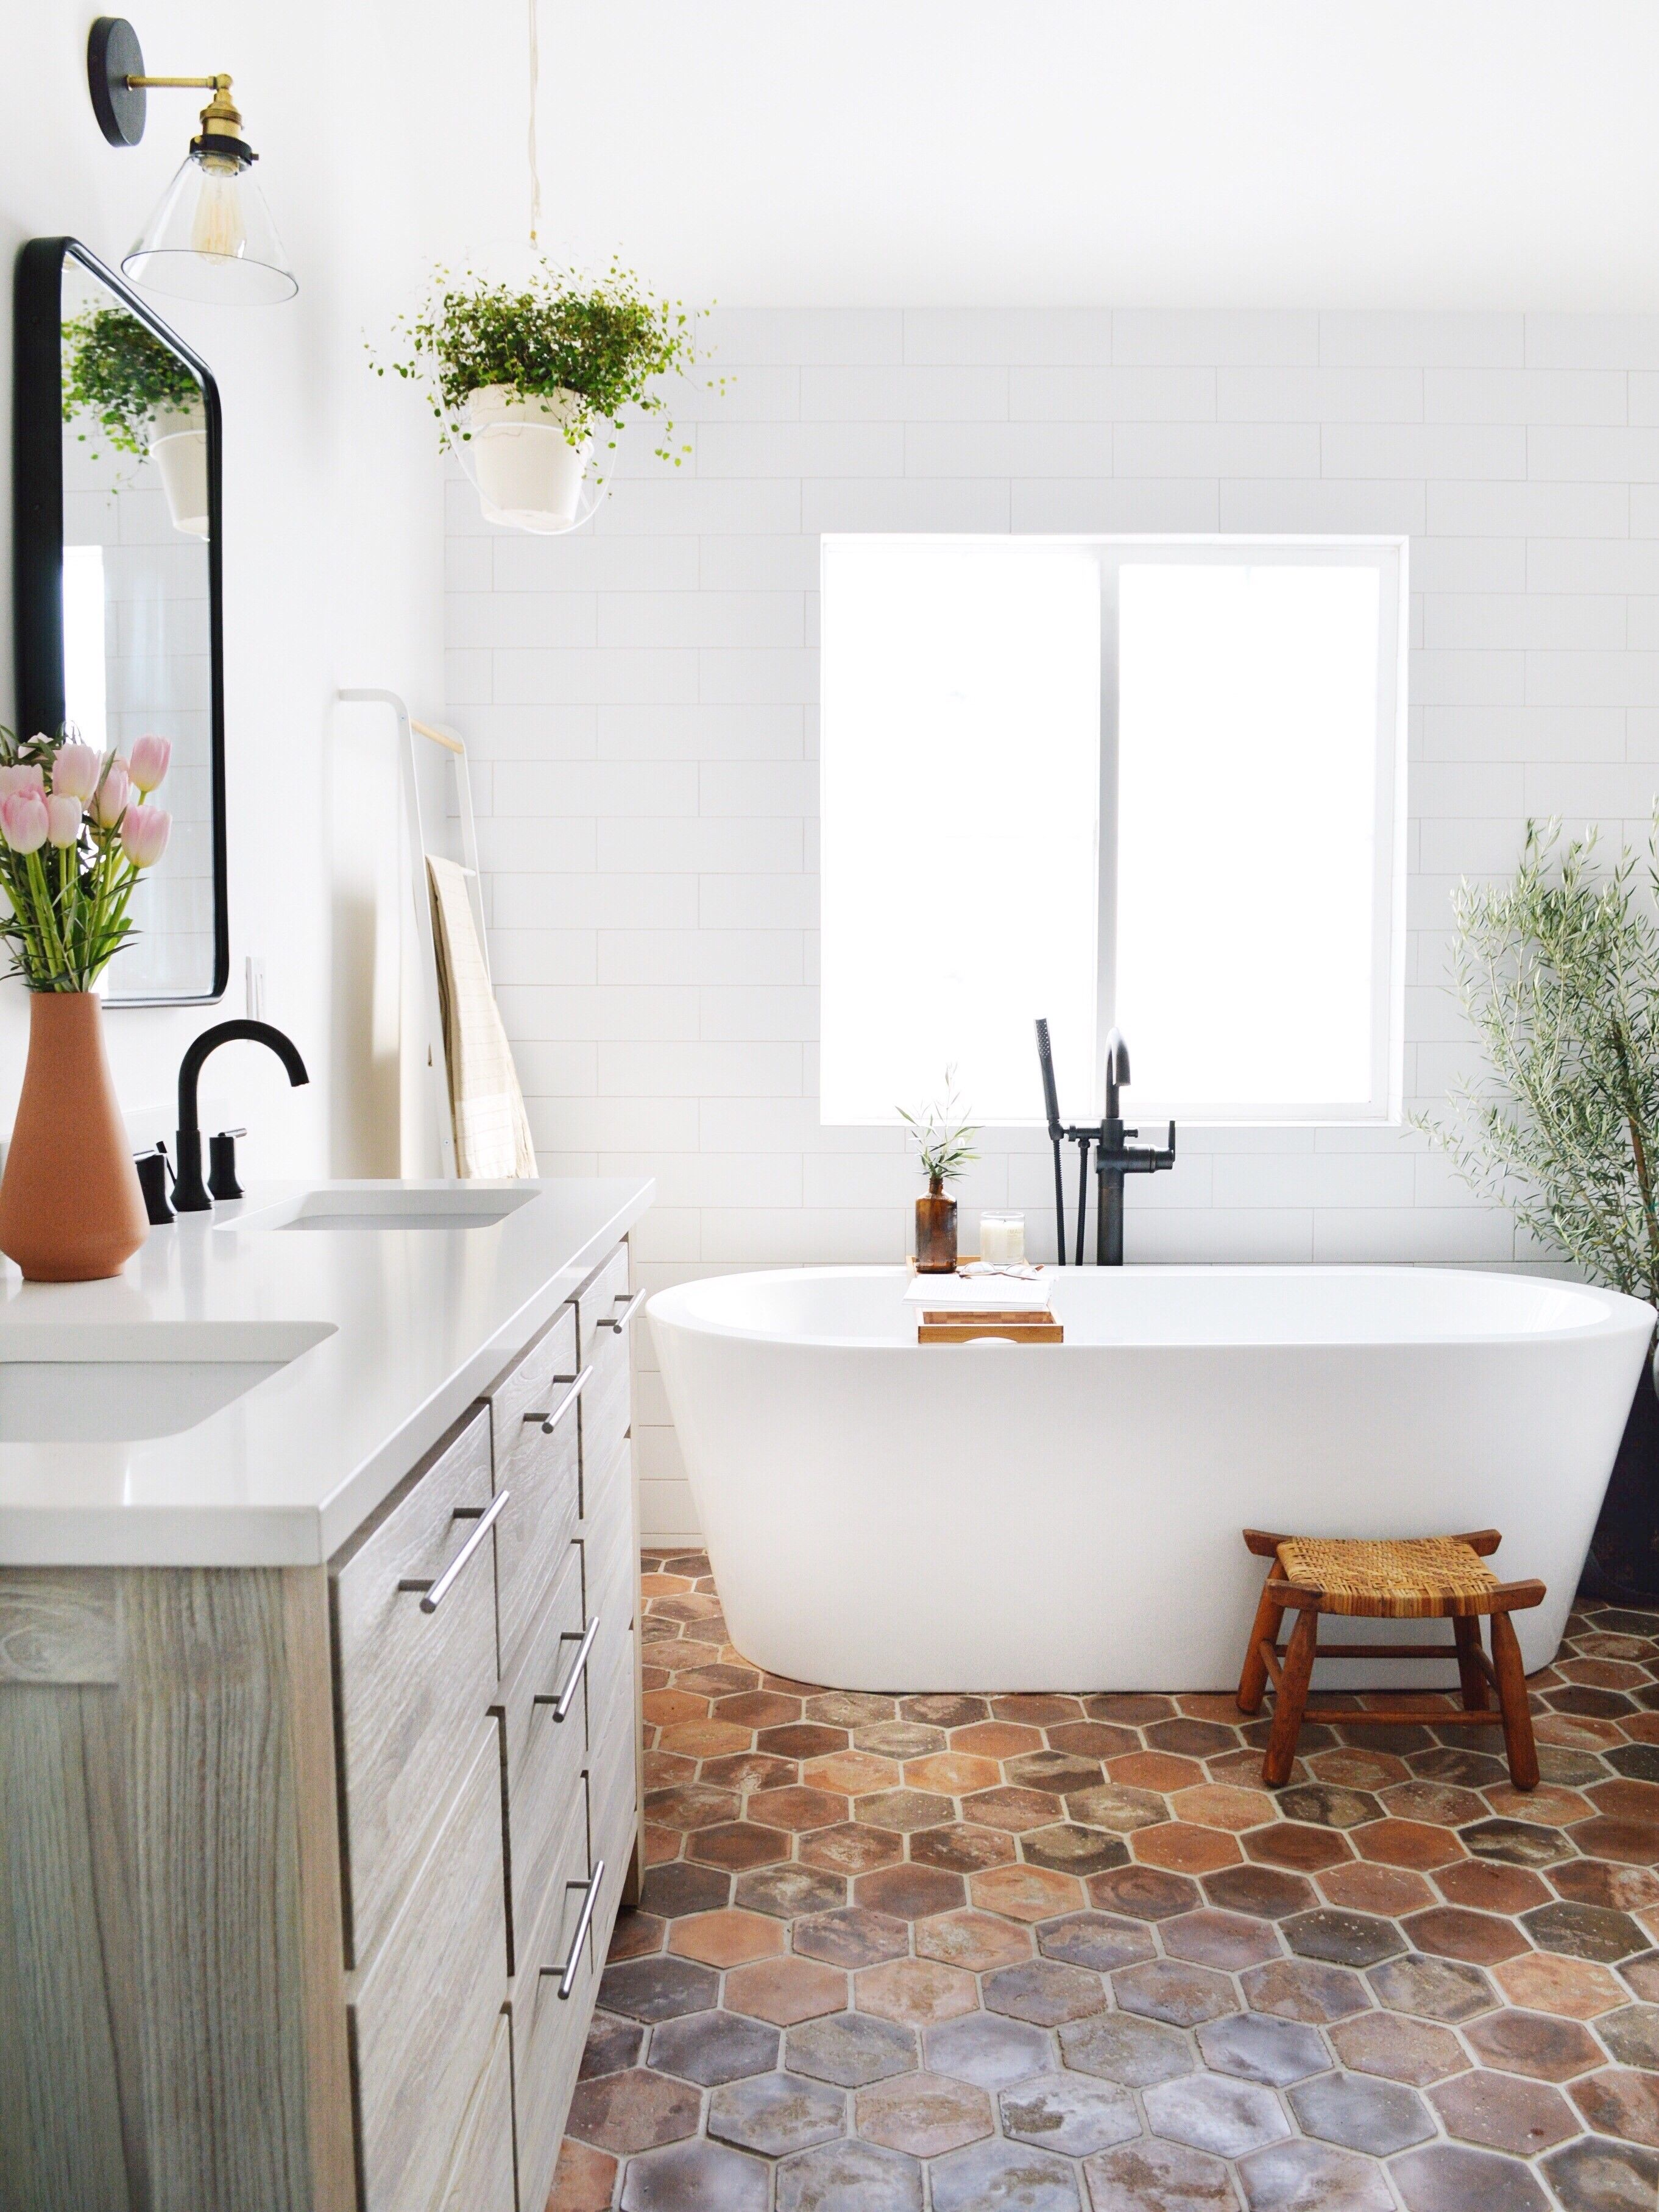 Leith Acrylic Freestanding Tub Spanish Style Bathrooms Modern Bathroom Design Traditional Bathroom